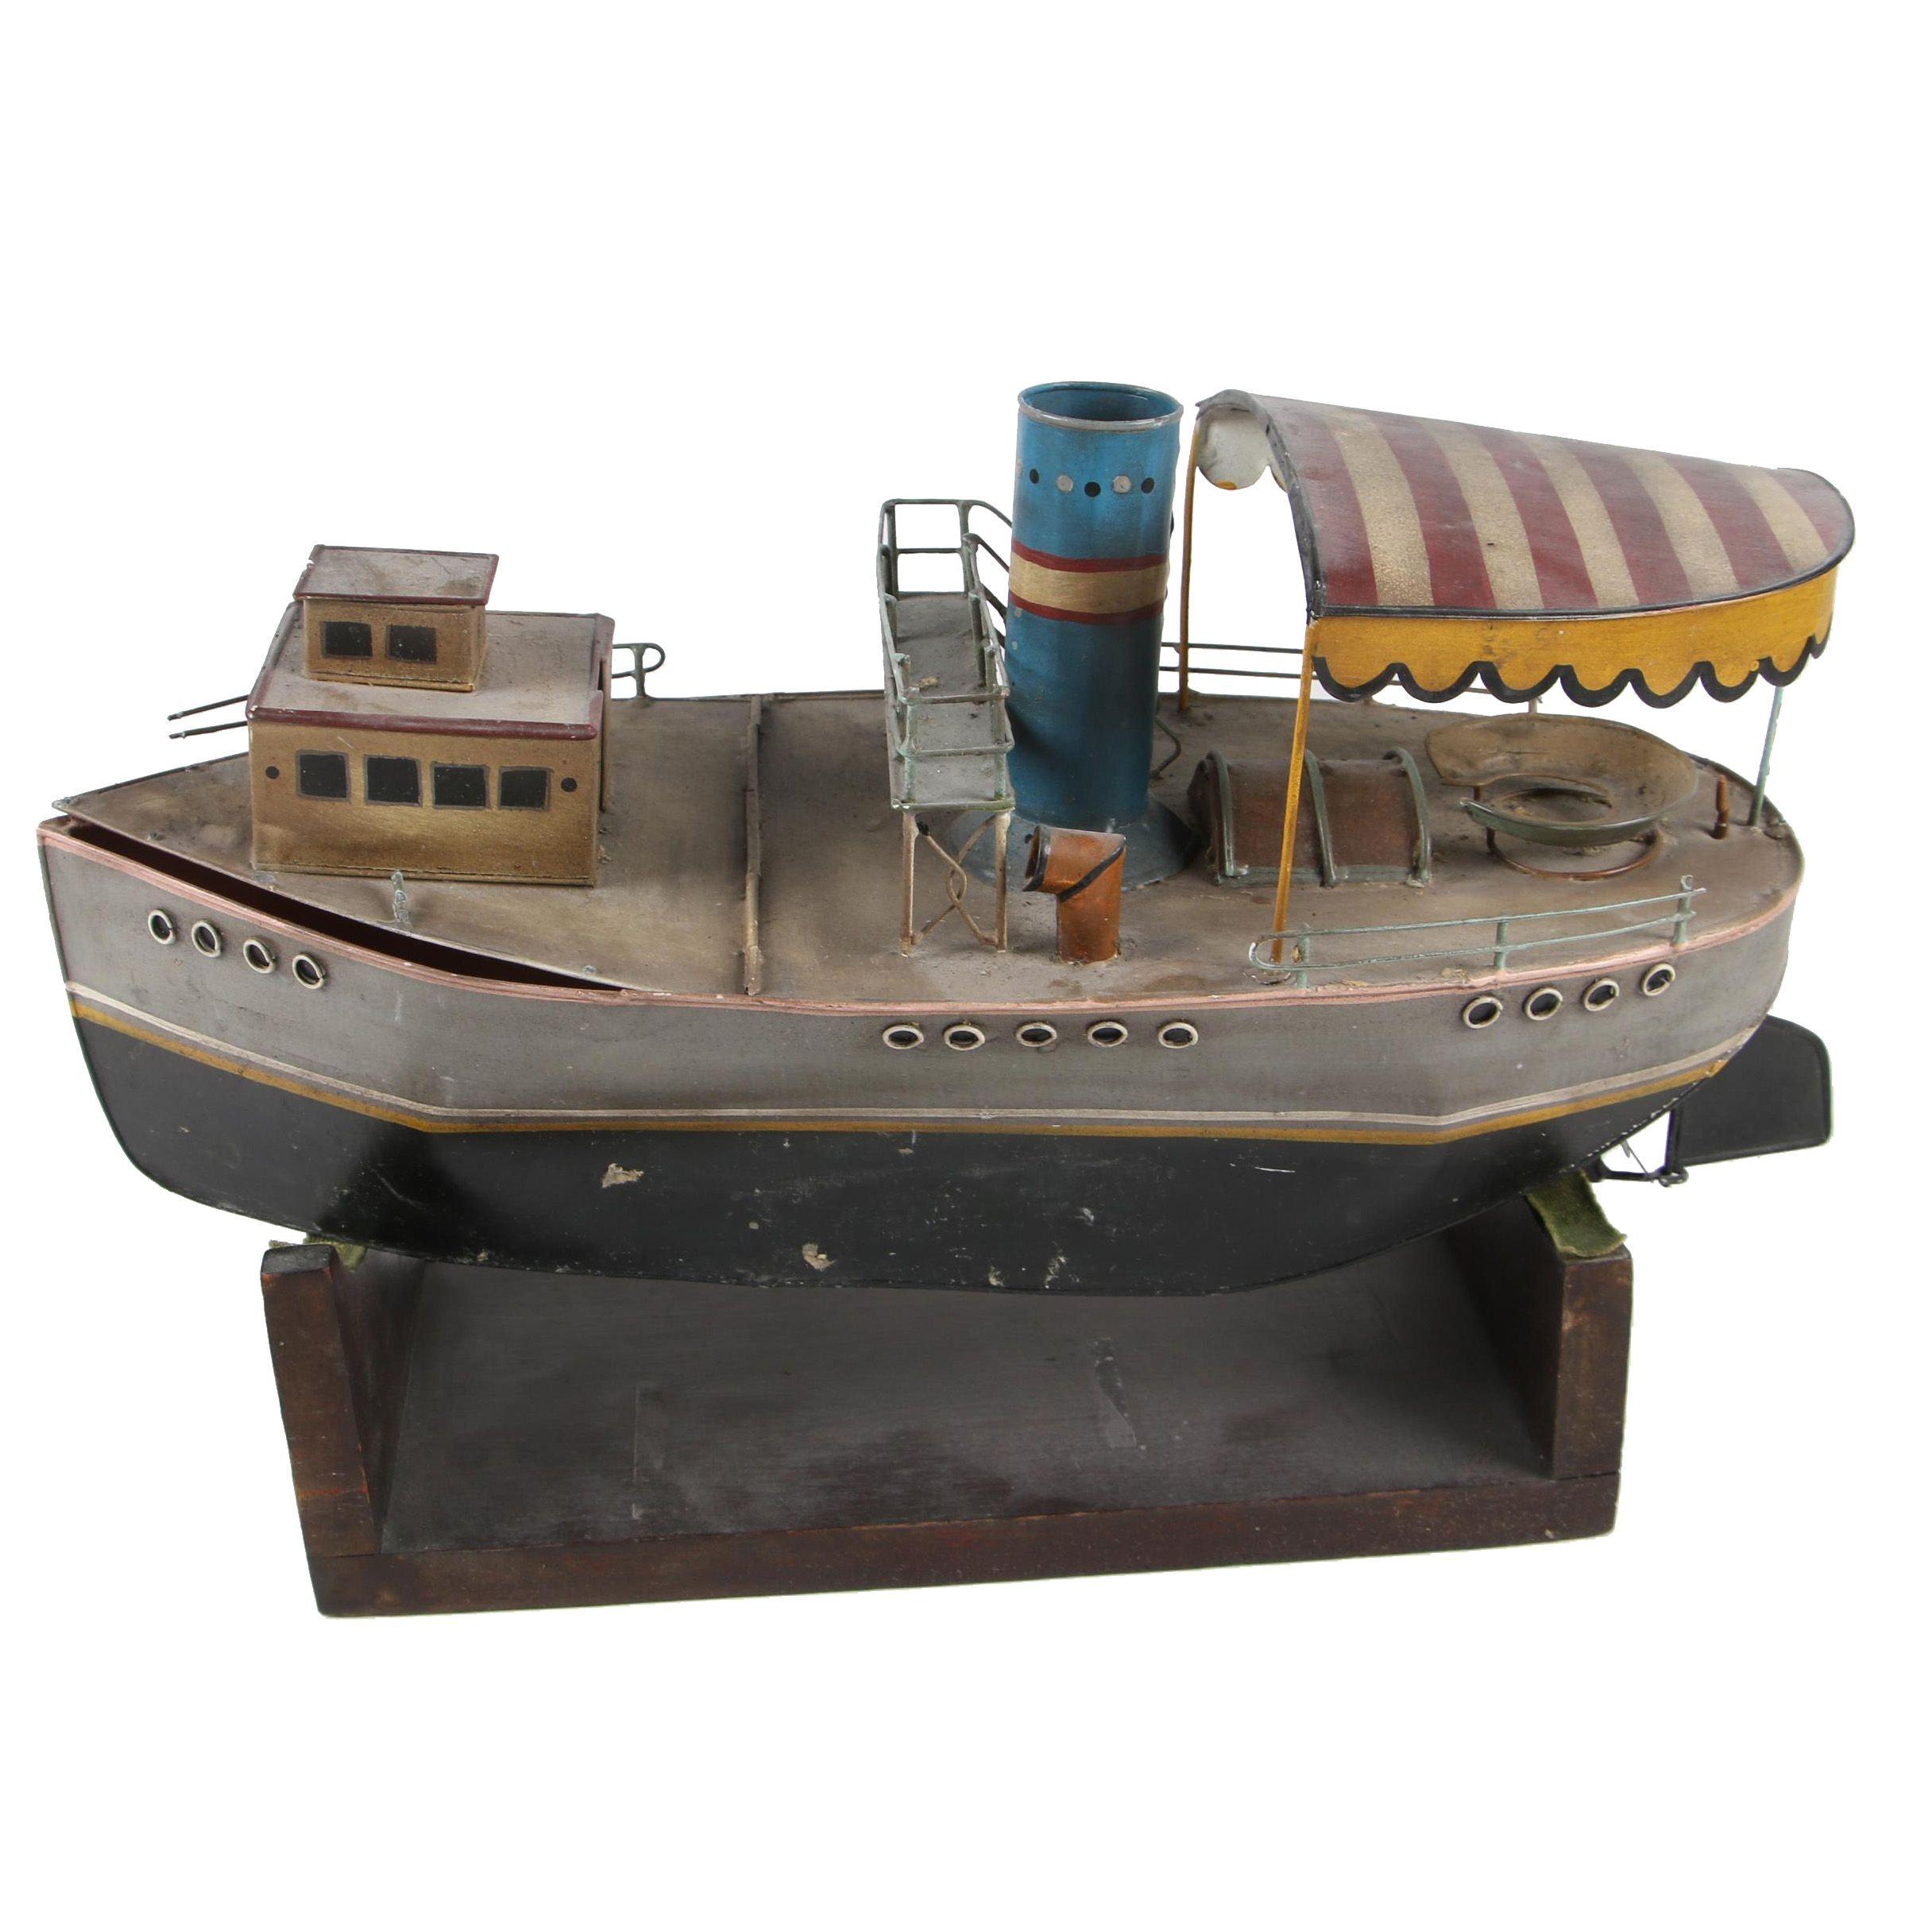 Decorative Tole Tugboat Model, Mid-Century